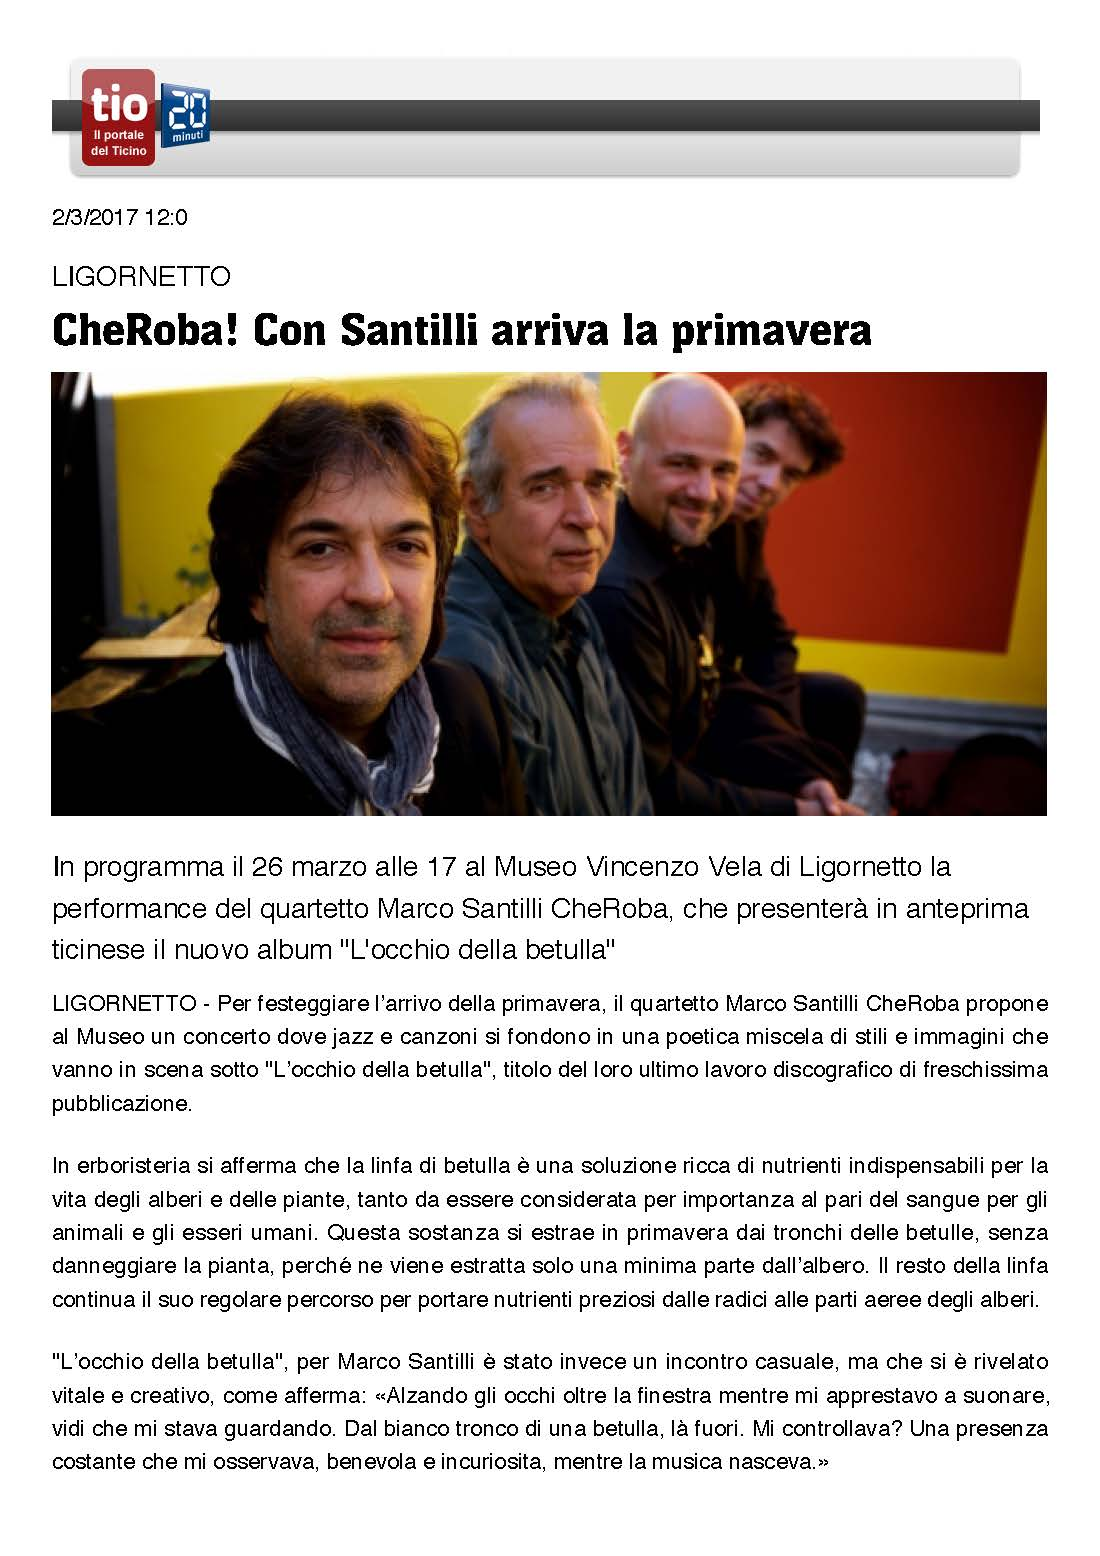 CheRoba concert announcement tio/20minuti online - Marco Santilli